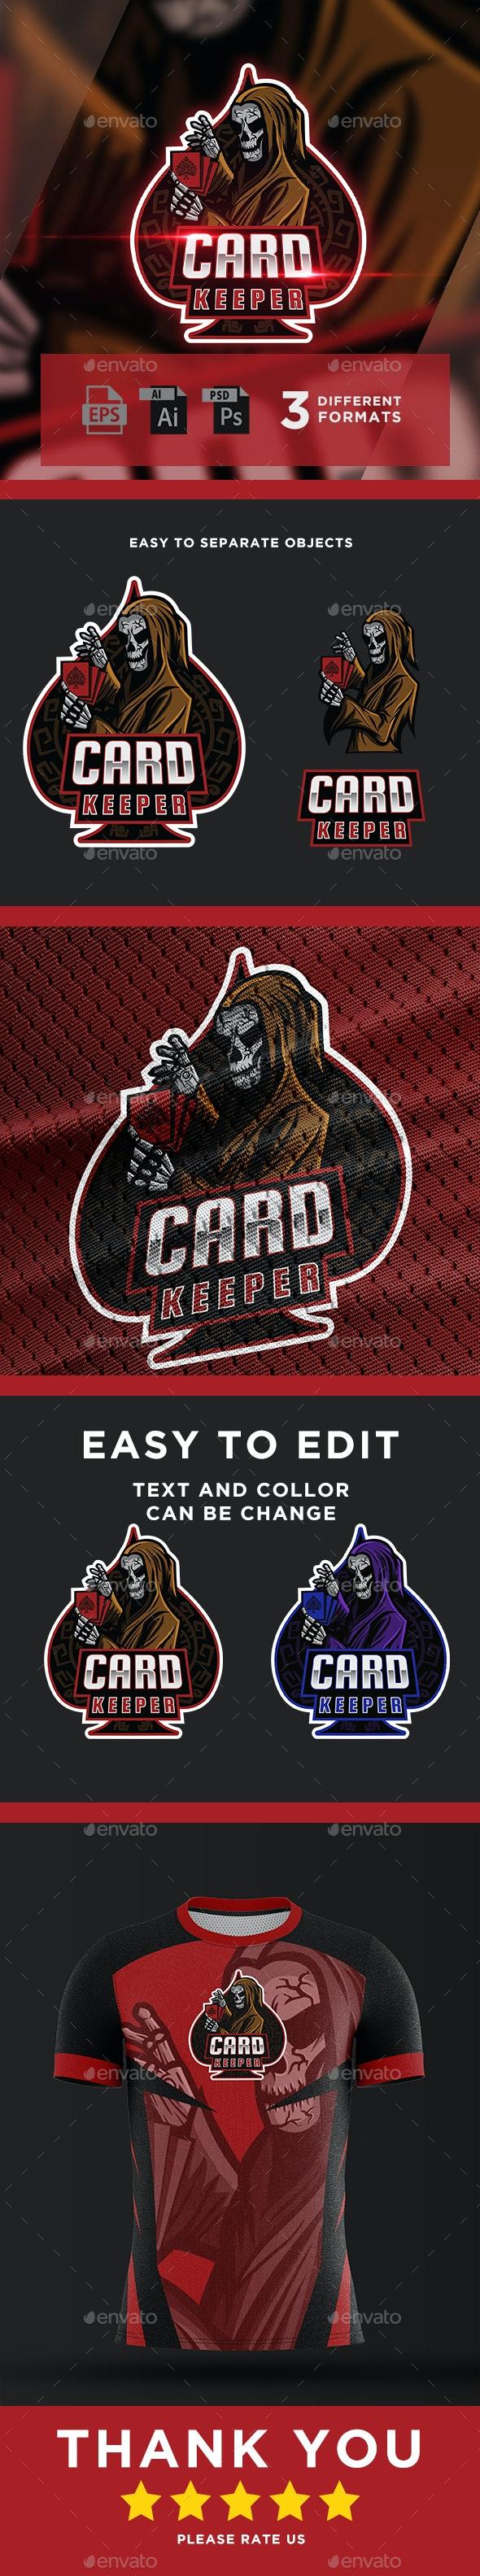 Card Keeper - Gaming Logo For Esports - Sports Logo Templates